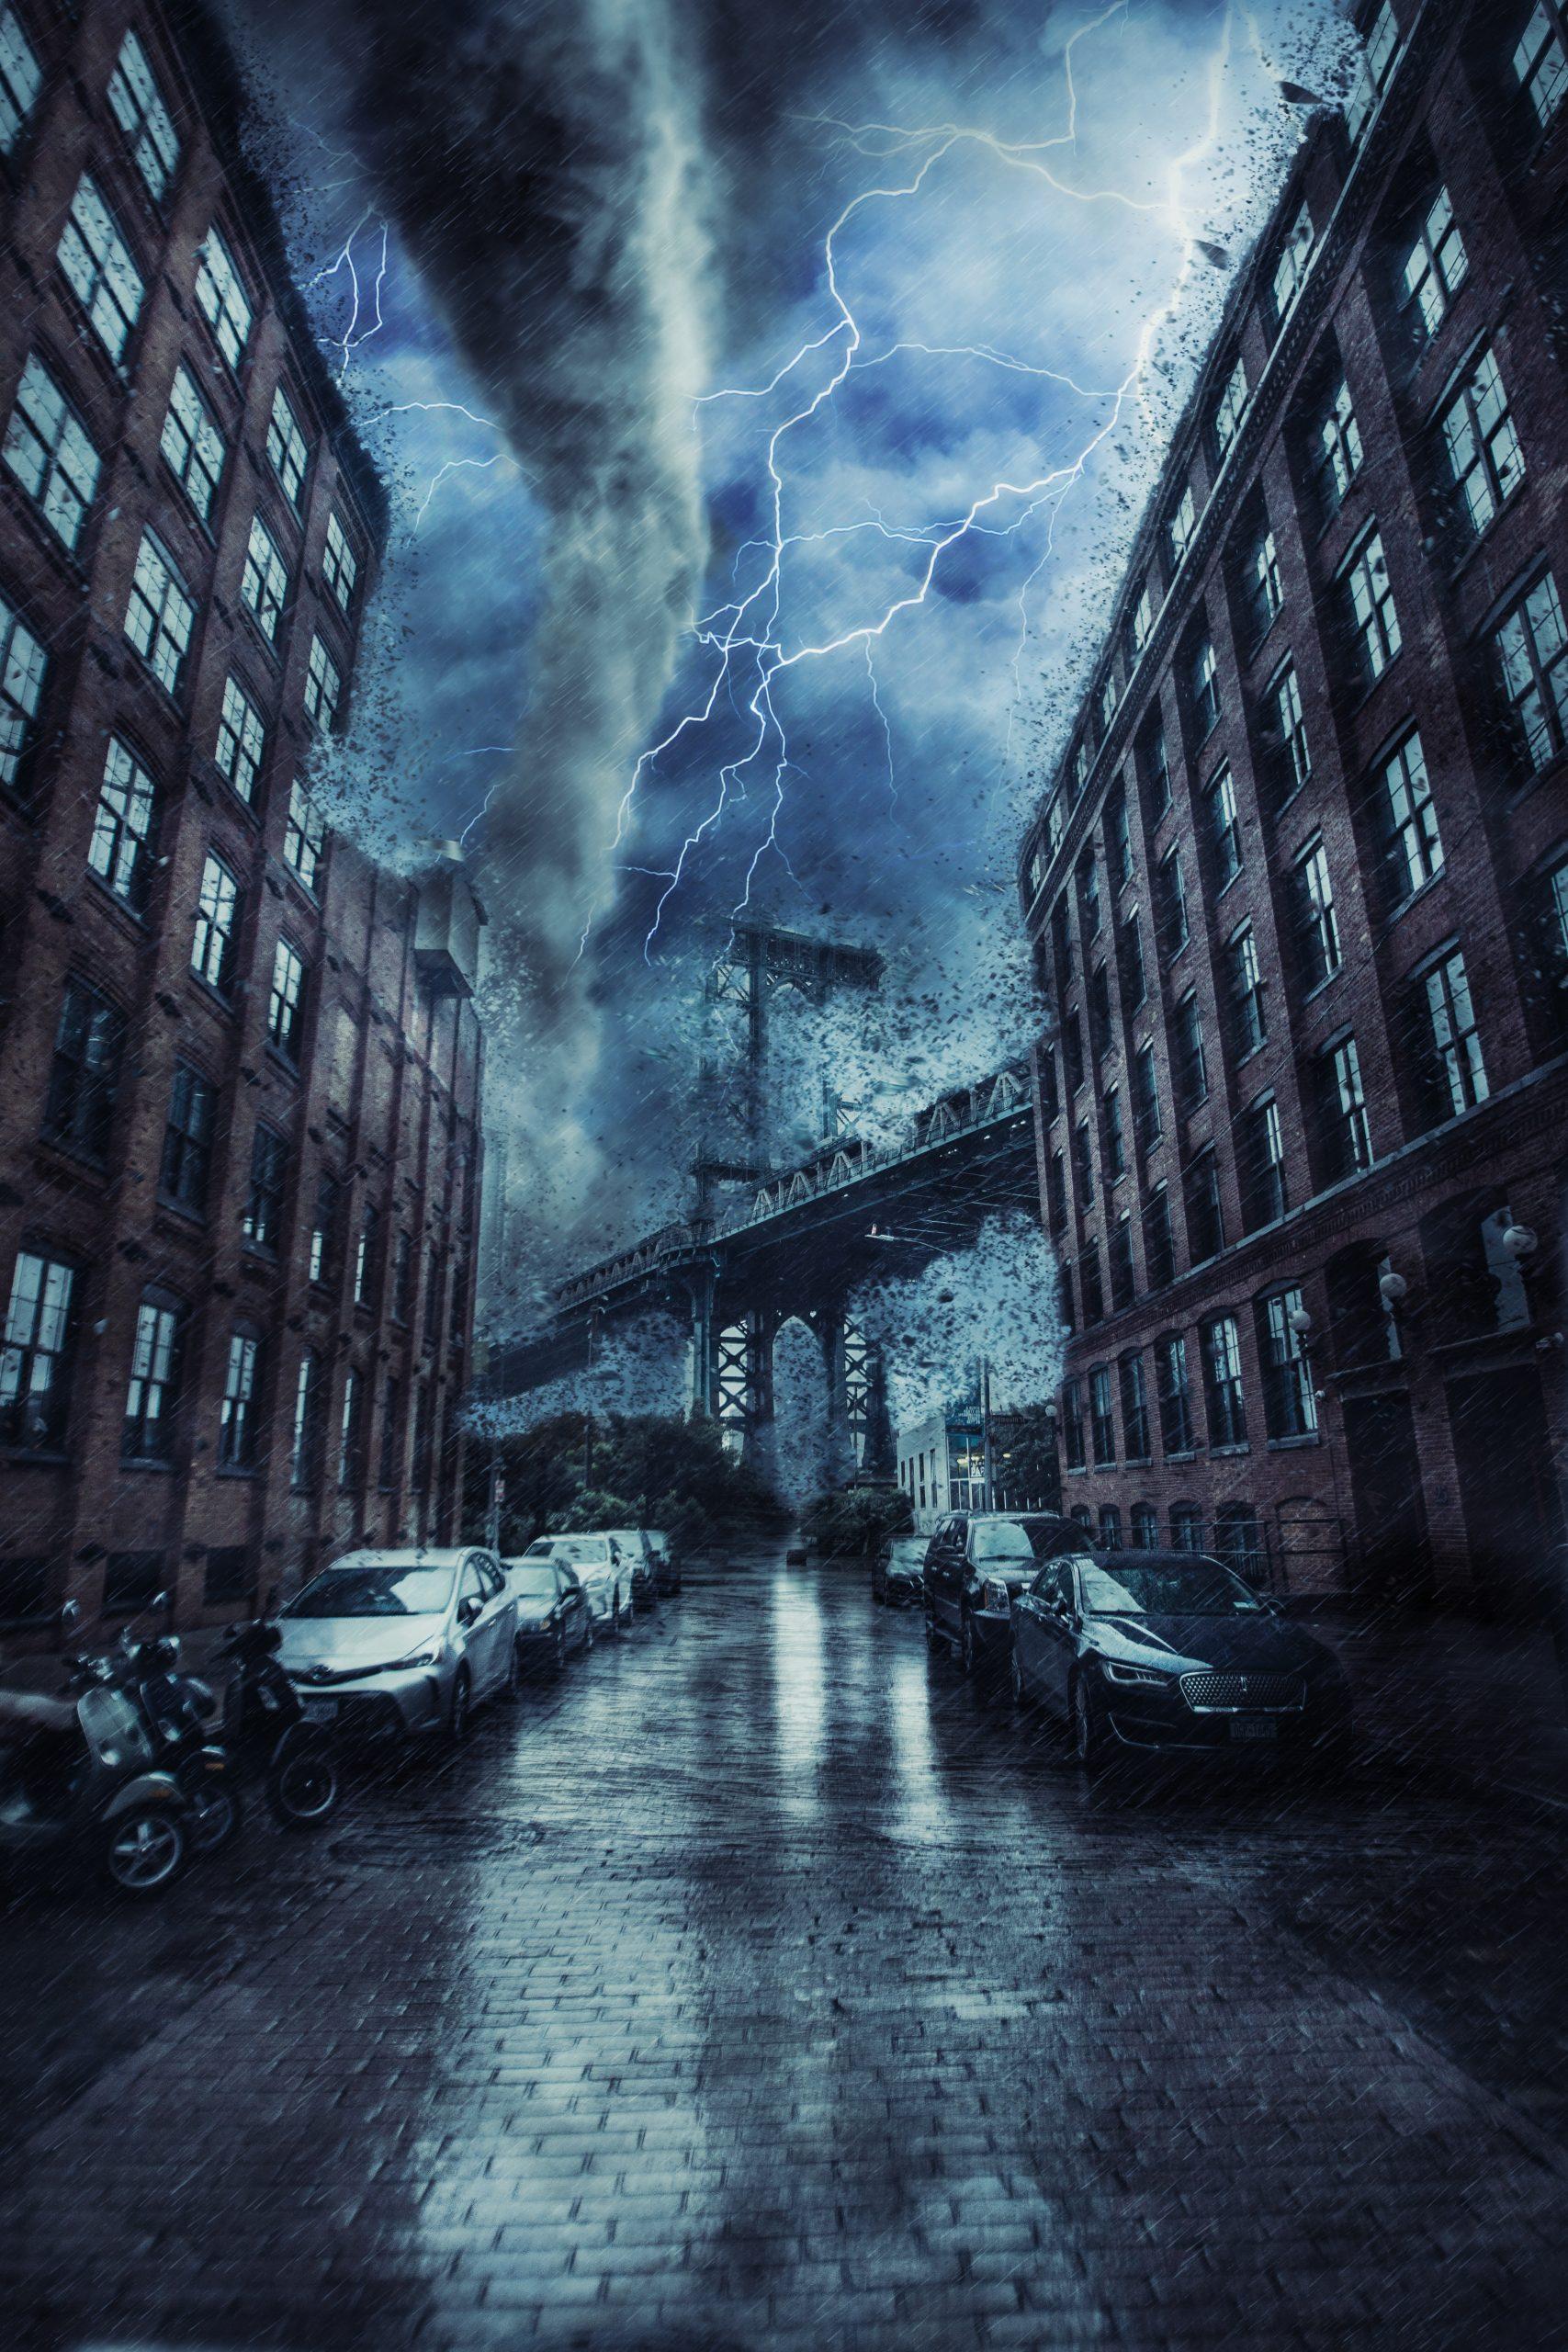 Thunder storm between buildings